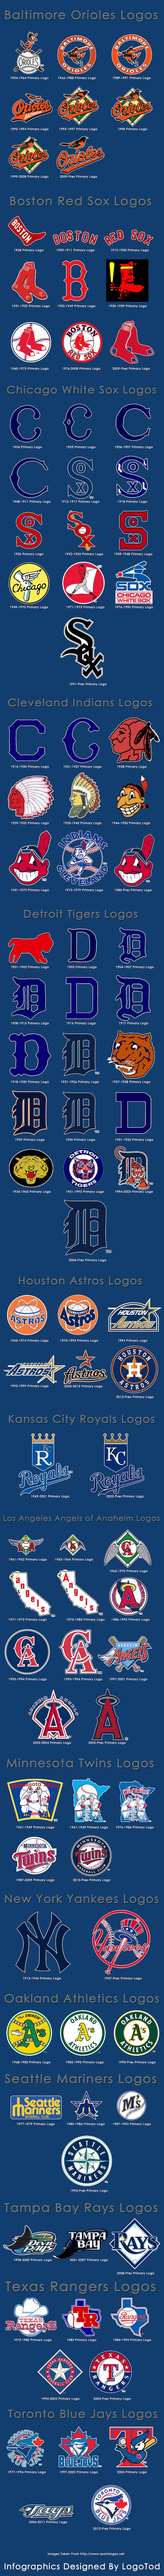 American League Team Logos Through The Years With Images Mlb Baseball Logo Baseball Teams Logo Baltimore Orioles Baseball